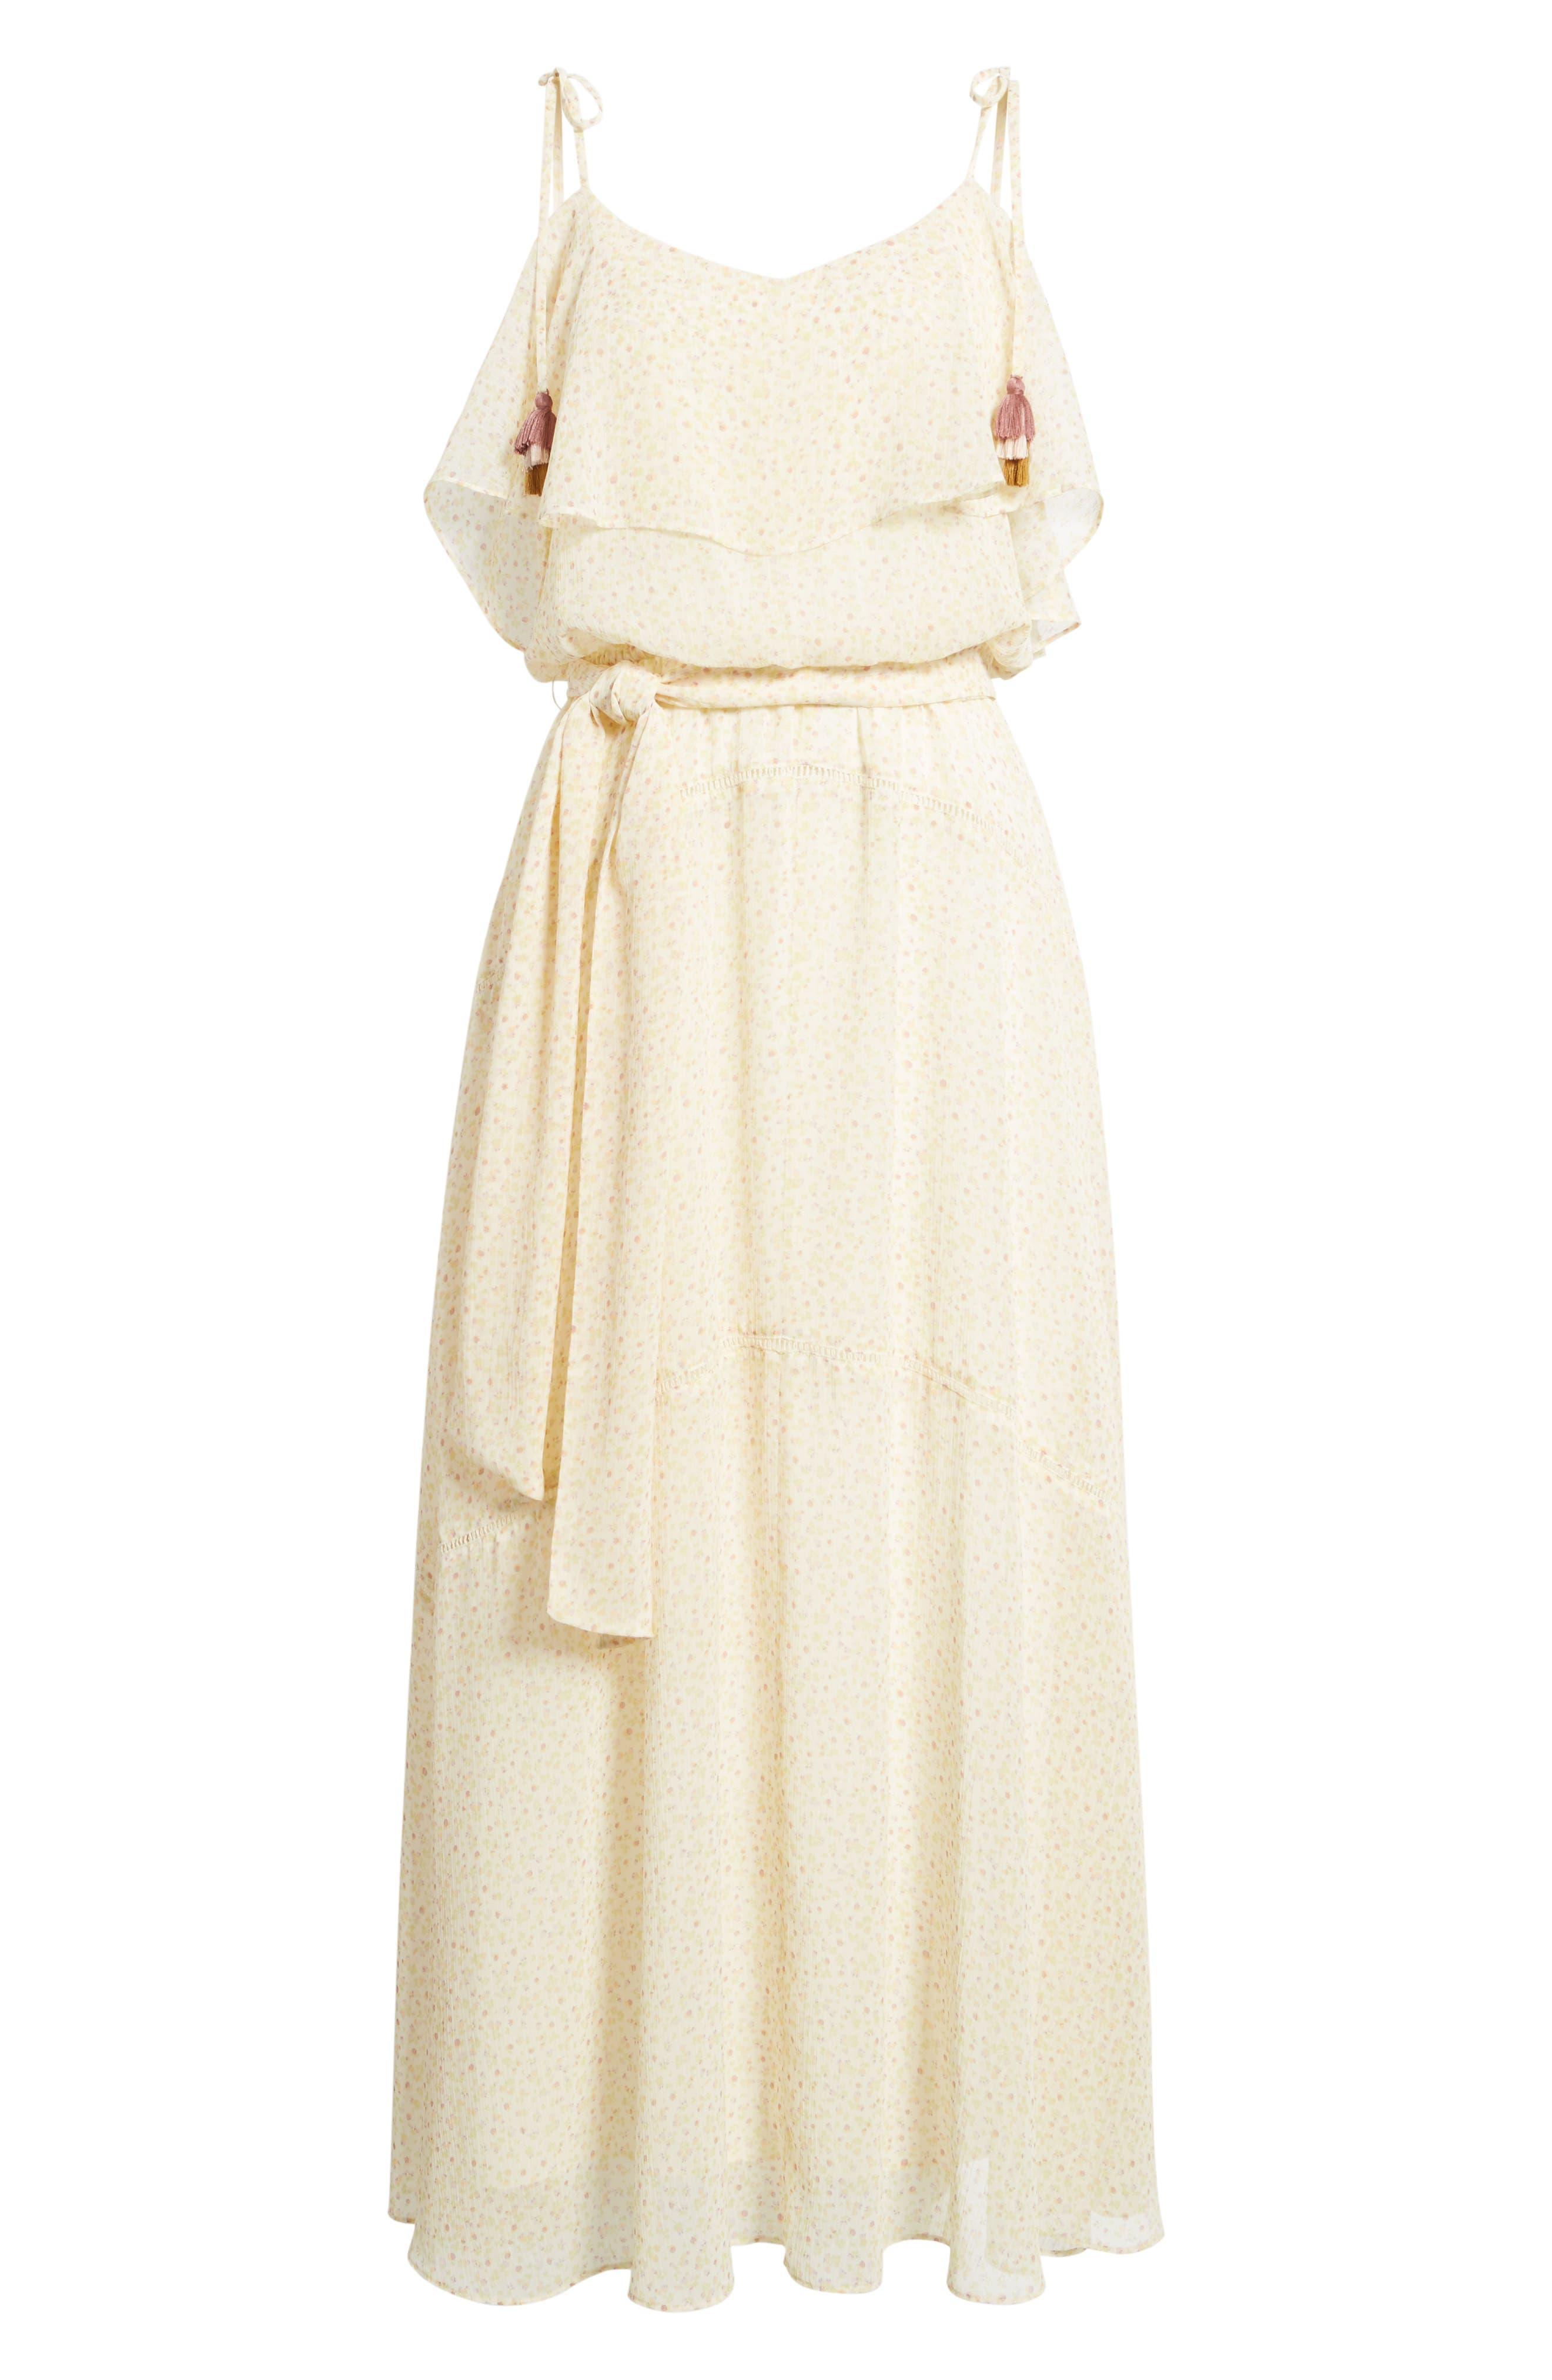 Decklan Maxi Dress,                             Alternate thumbnail 6, color,                             900